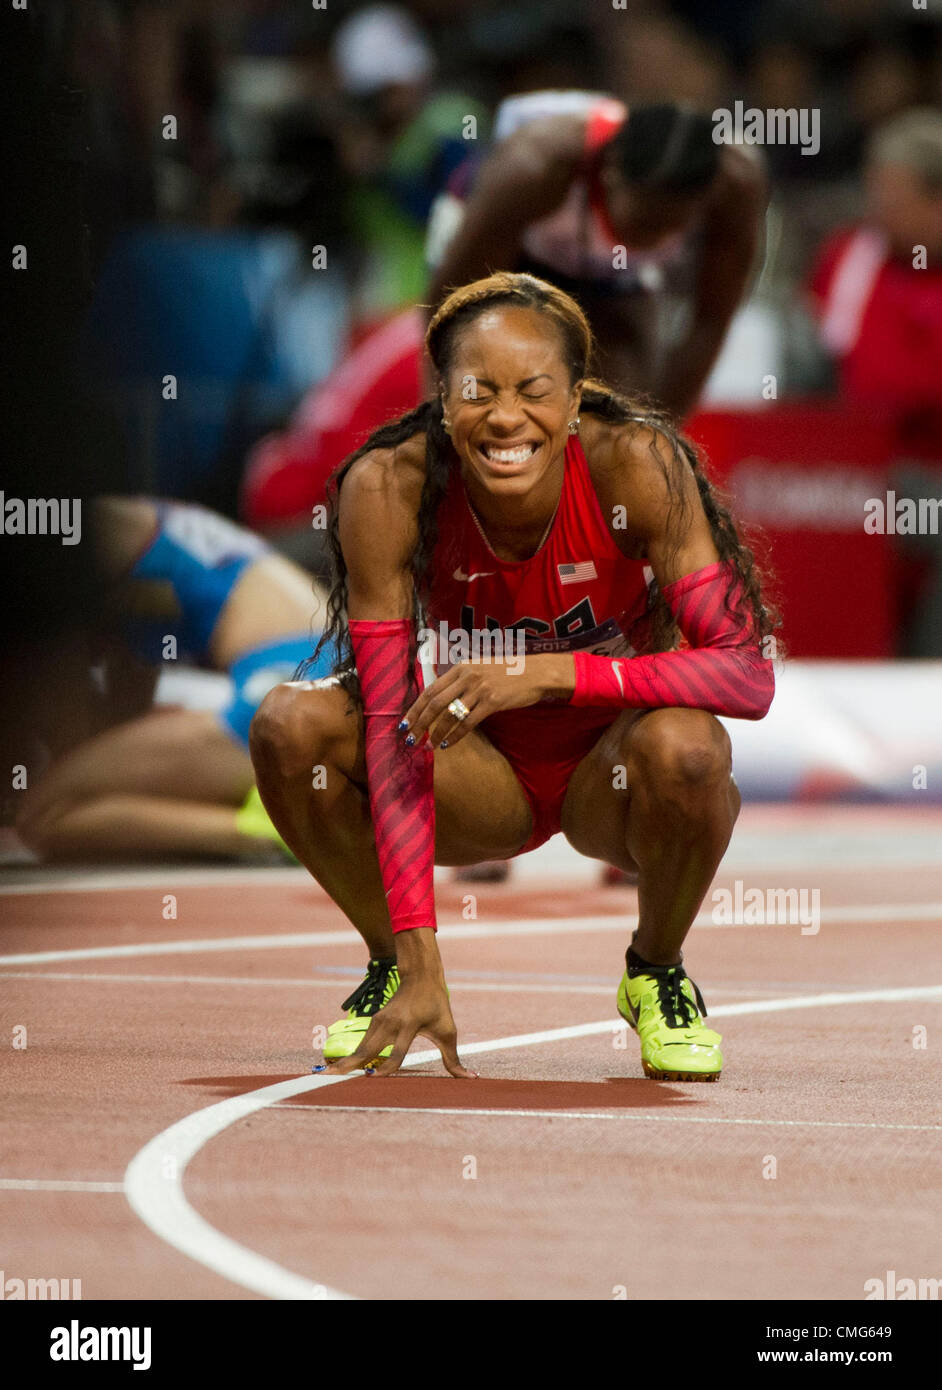 Sanya Richards-Ross 5 Olympic medals Sanya Richards-Ross 5 Olympic medals new images